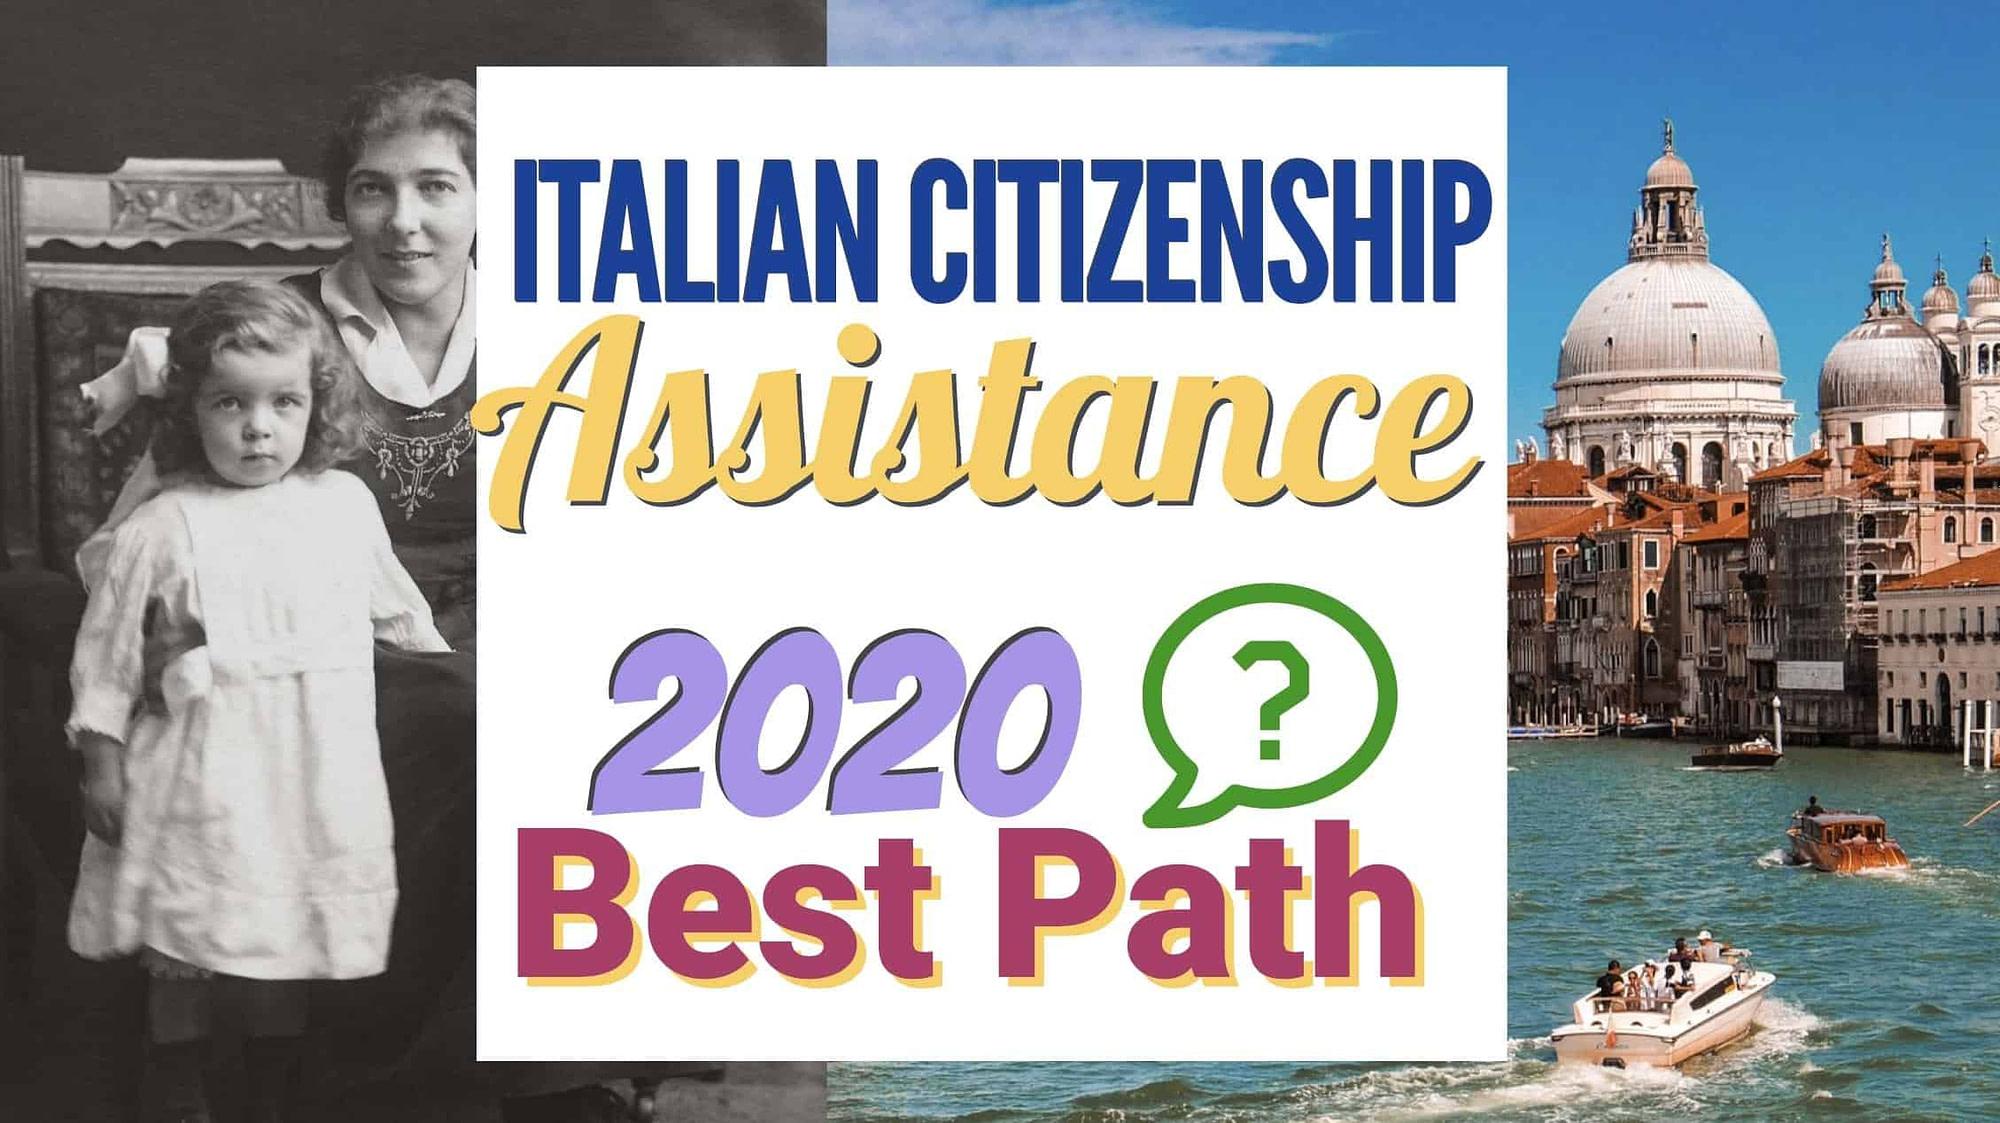 italian-citizenship-assistance-2020-italian-citizenship-assistance-usa-ITALIAN CITIZENSHIP BY DESCENT USA AMERICAN DESCENDENDANTS italian-citizeship-jure-sanguinis-boost-italian-citizenship-by-descent-italian-citizenship-processing-time-speed-up-italian-citizenship-by-descent-processing-time-italian-citizenship-assistance-italian-dual-citizenship-lawyer-italian-citizenship-service-italian-citizenship-jure-sanguinis-assistance-boost-italian-citizenship-processing-time-italian-citizeship-jure-sanguinis-boost-italian-citizenship-by-descent-italian-citizenship-processing-time-speed-up-italian-citizenship-by-descent-processing-time-italian-citizenship-assistance-italian-dual-citizenship-lawyer-italian-citizenship-service-italian-citizenship-jure-sanguinis-assistance-boost-italian-citizenship-processing-time